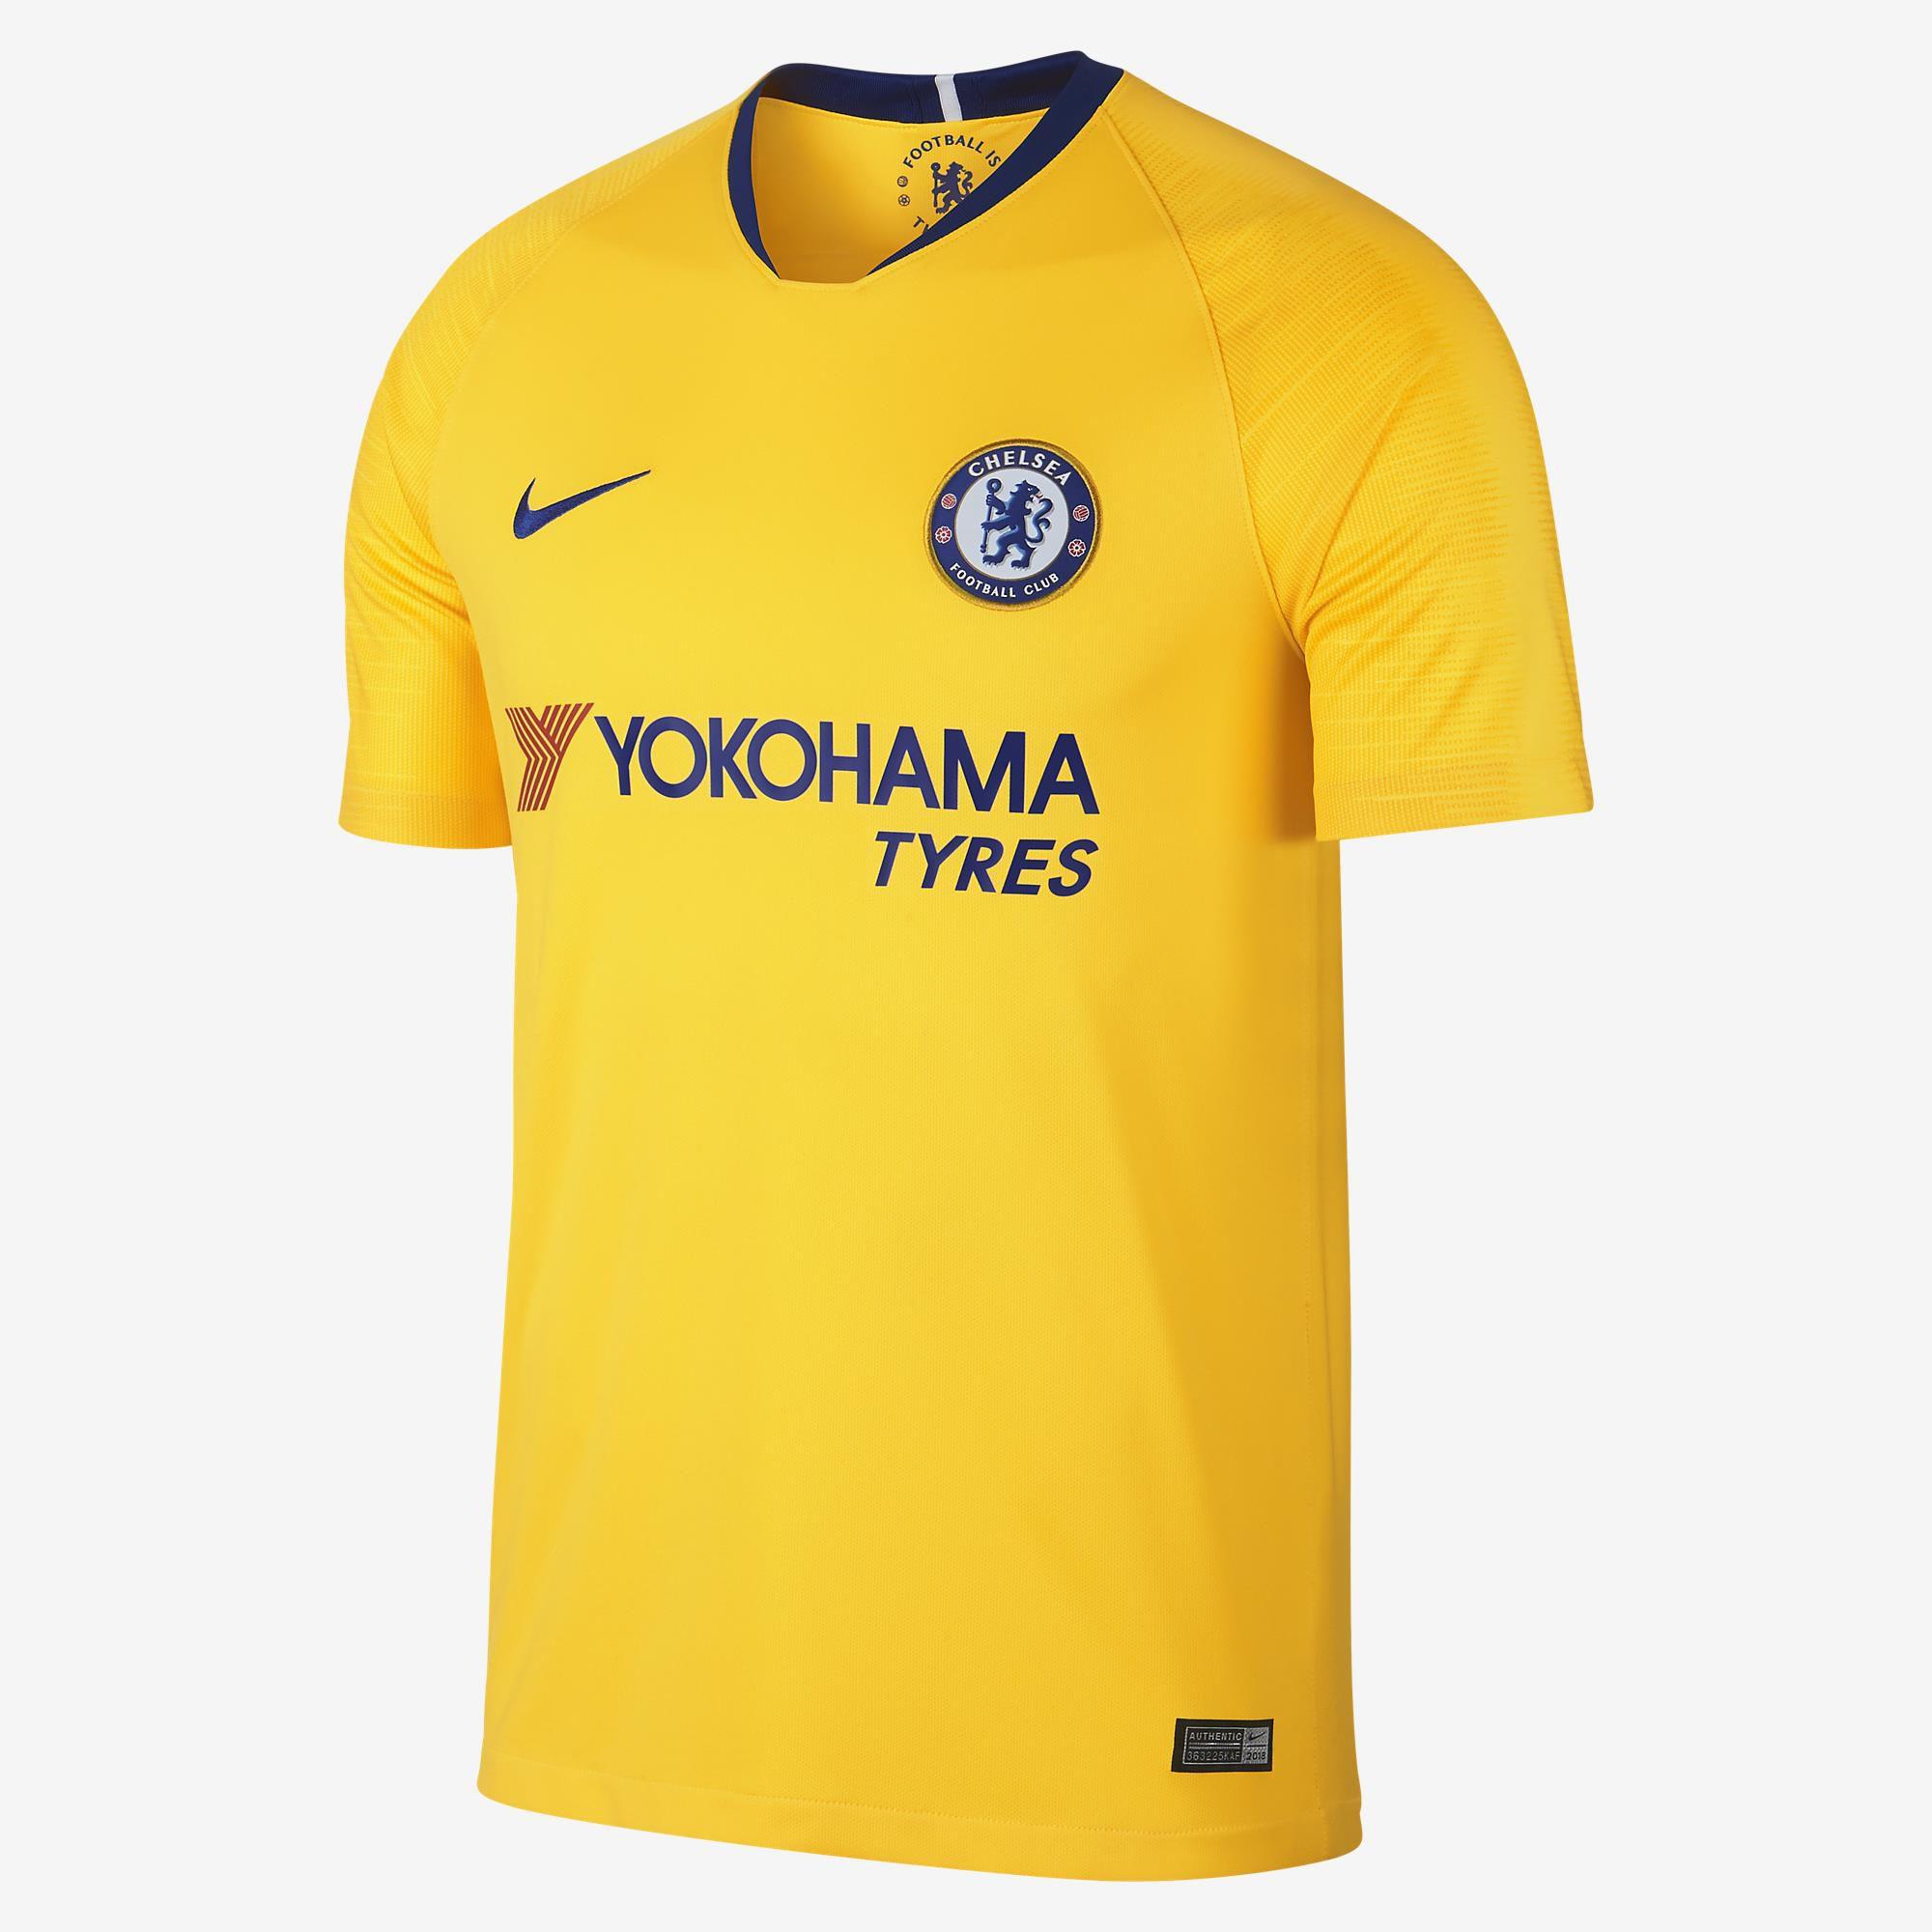 00067973c5 Camisa Chelsea Away Nike 2018 19